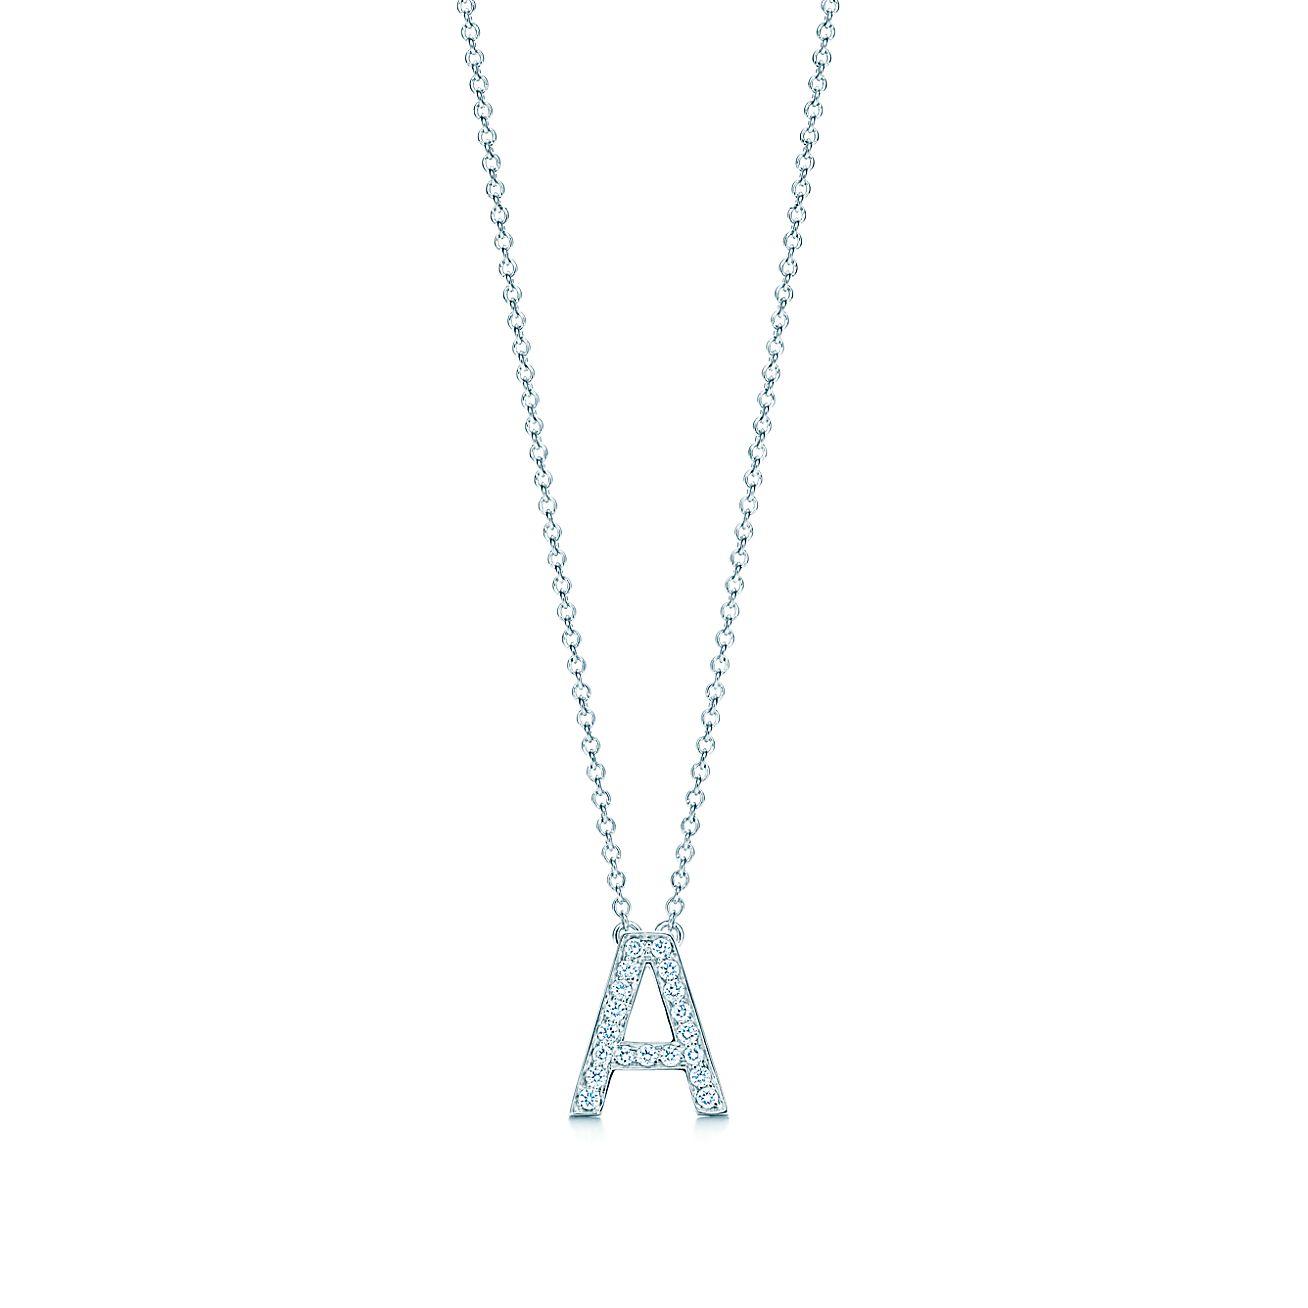 Tiffany letters pendant of diamonds in platinum mini letters a z tiffany letters pendant of diamonds in platinum mini letters a z available tiffany co aloadofball Choice Image